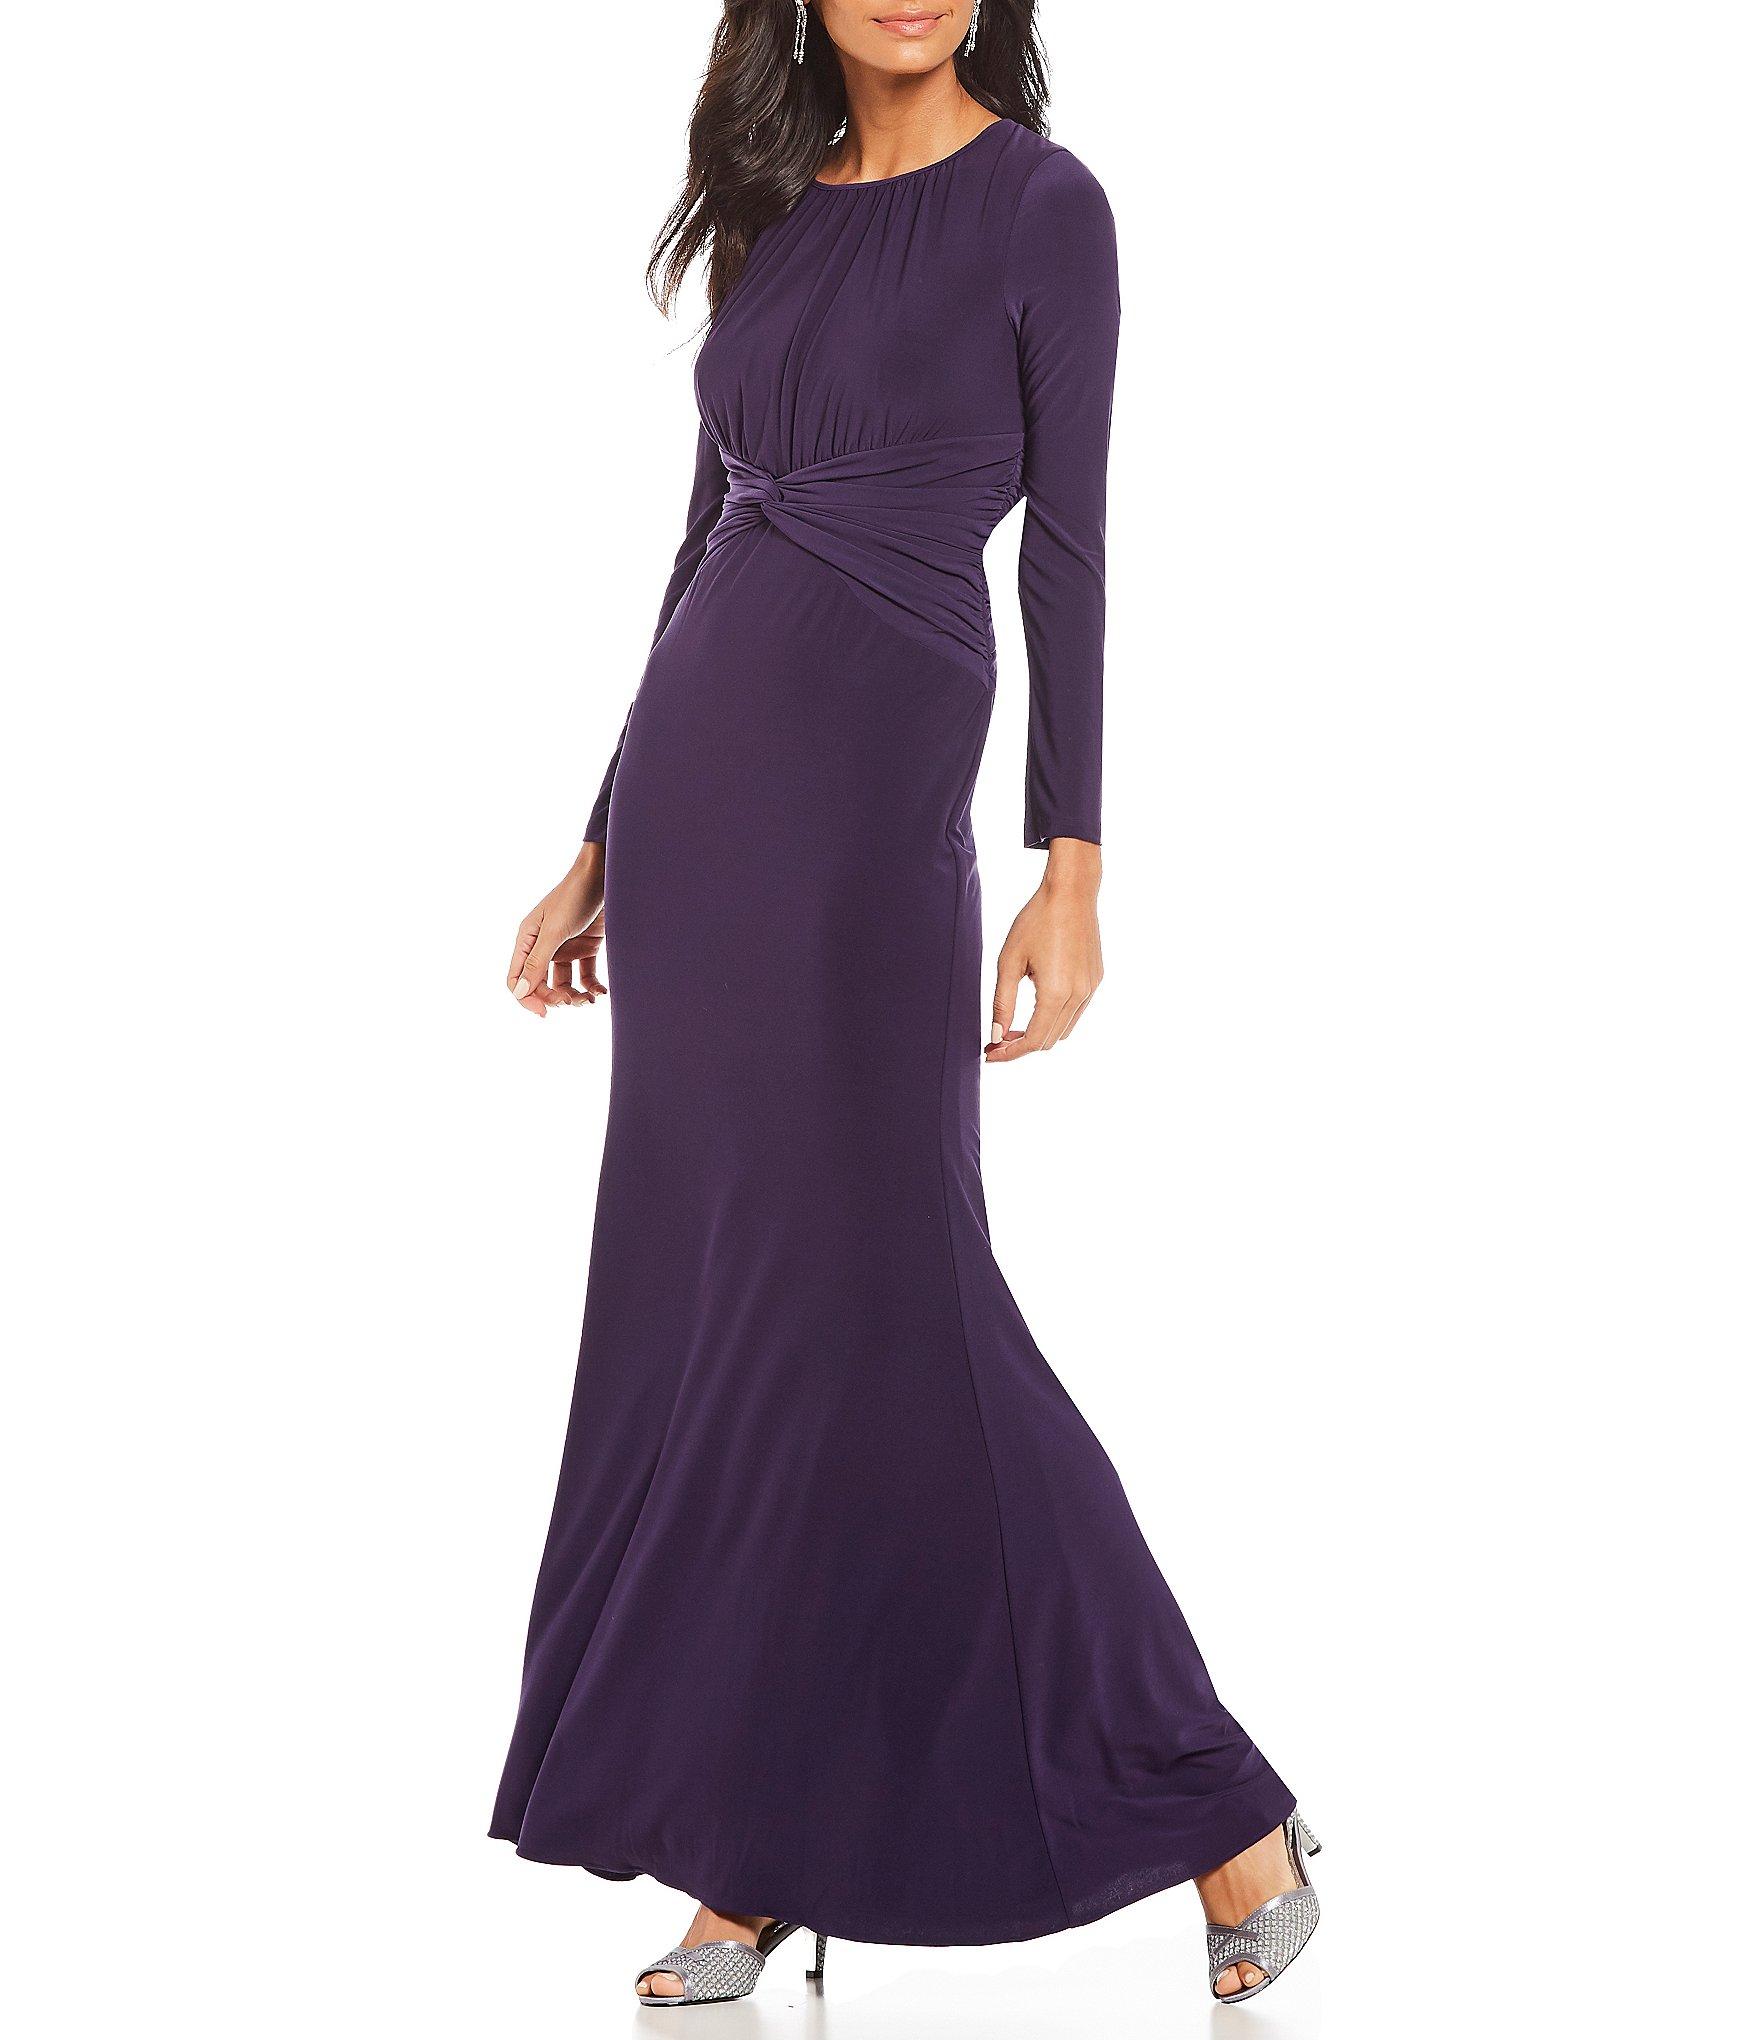 Purple Dillards Mother of Bride Dresses